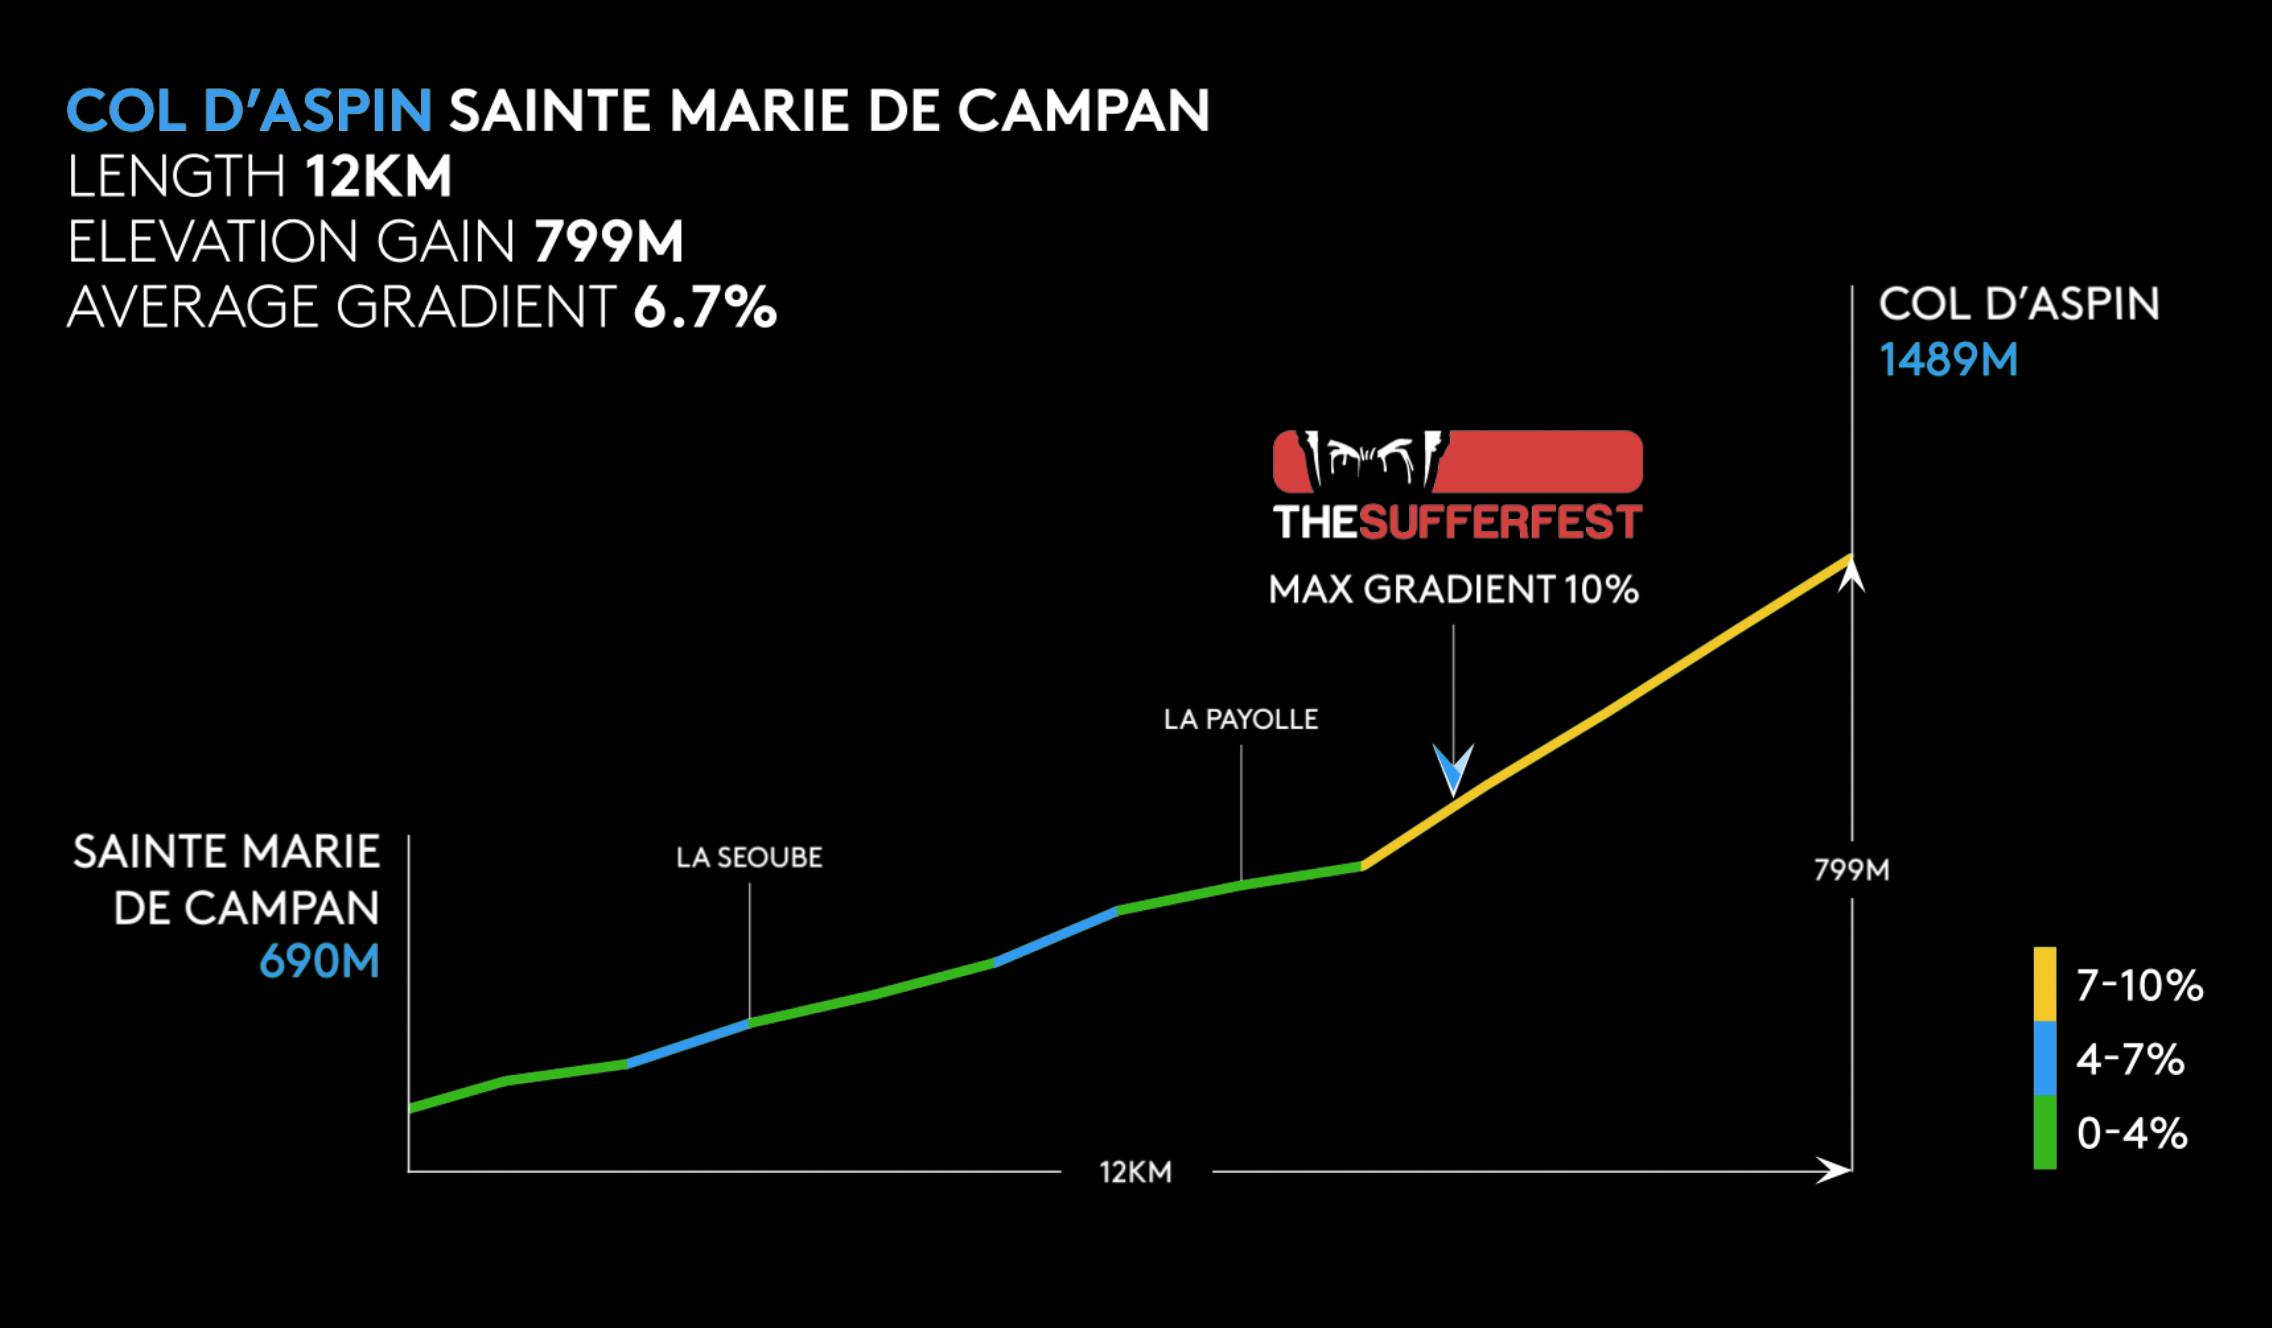 Hotel Les Deux Cols St Marie De Campan